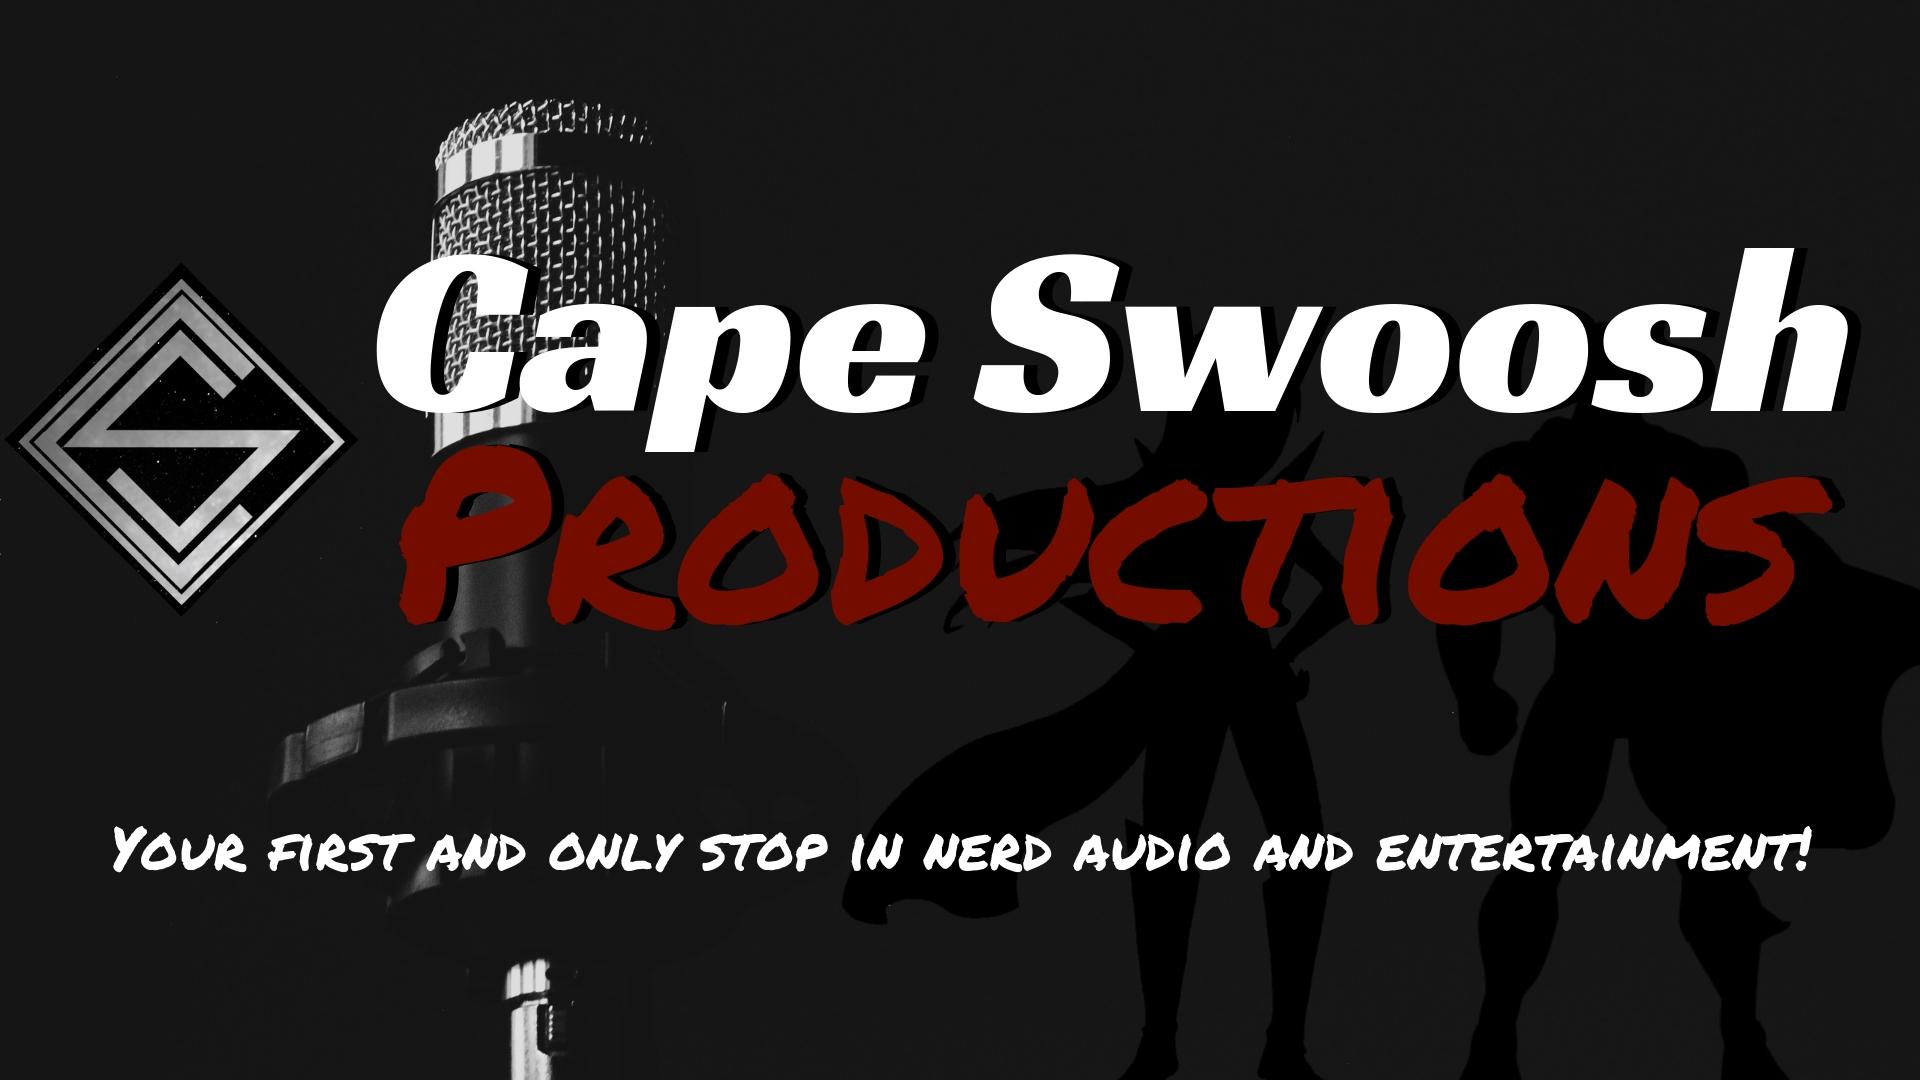 Cape Swoosh banner